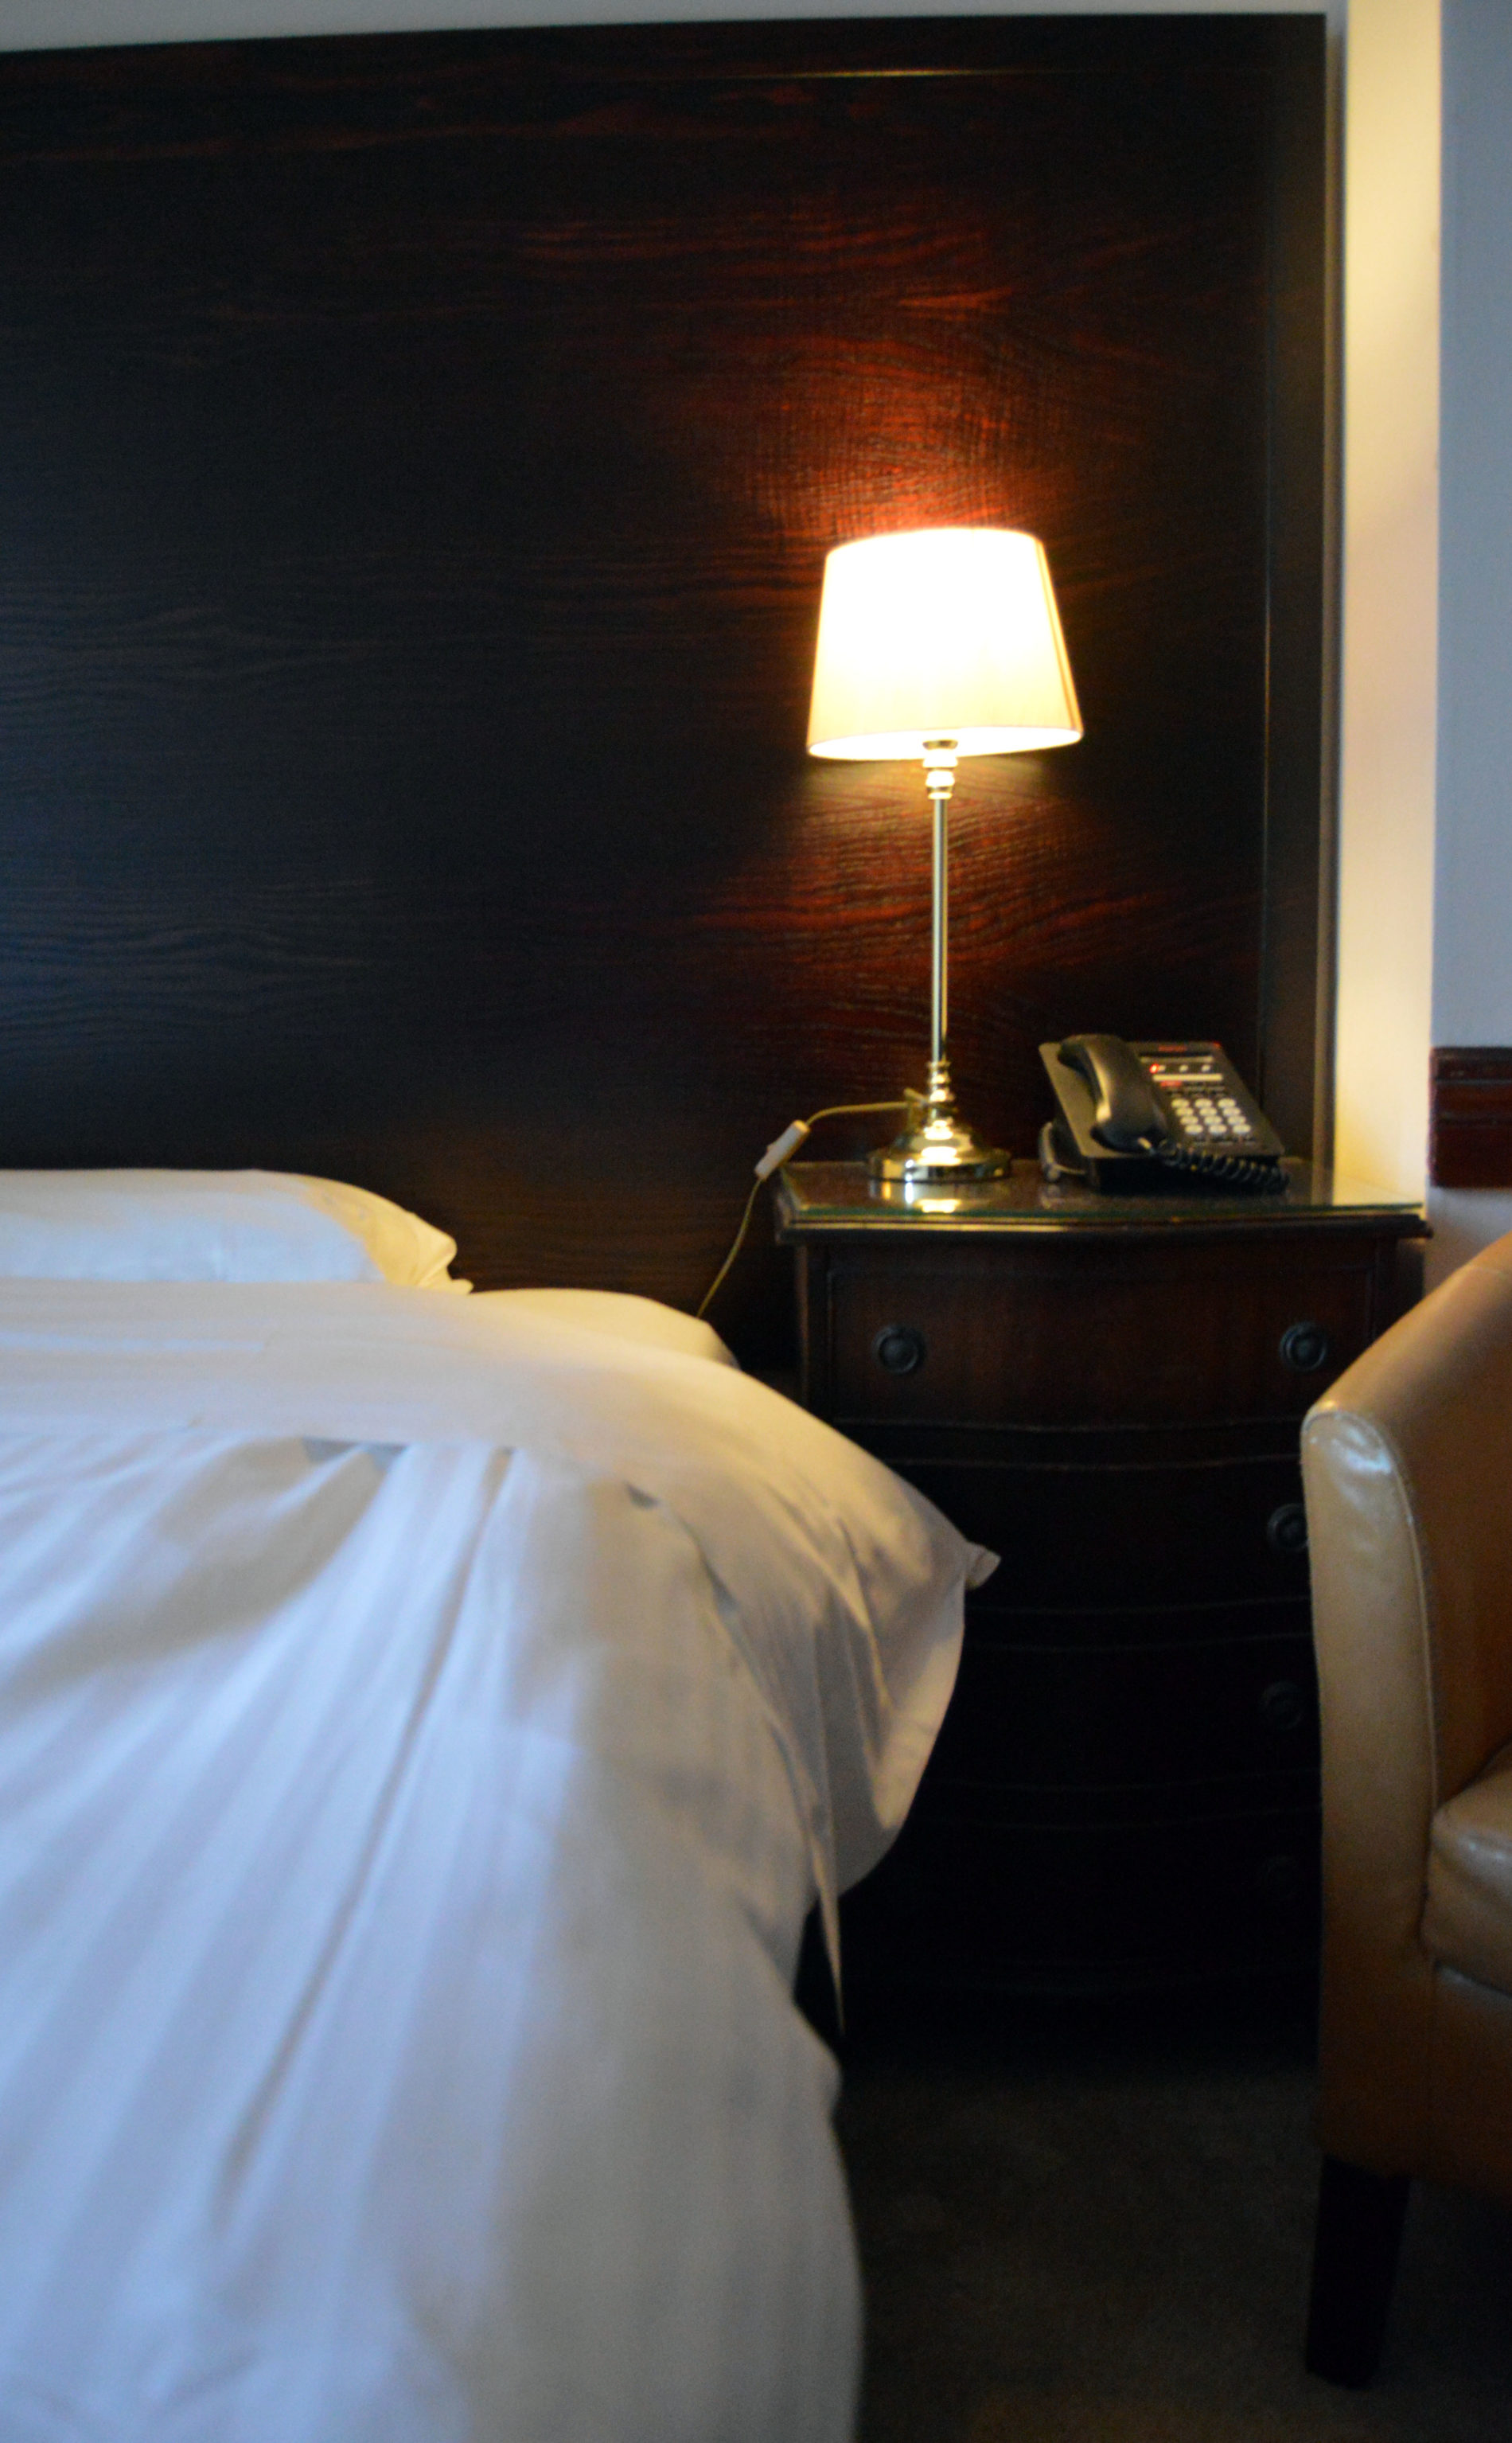 Room 4 B